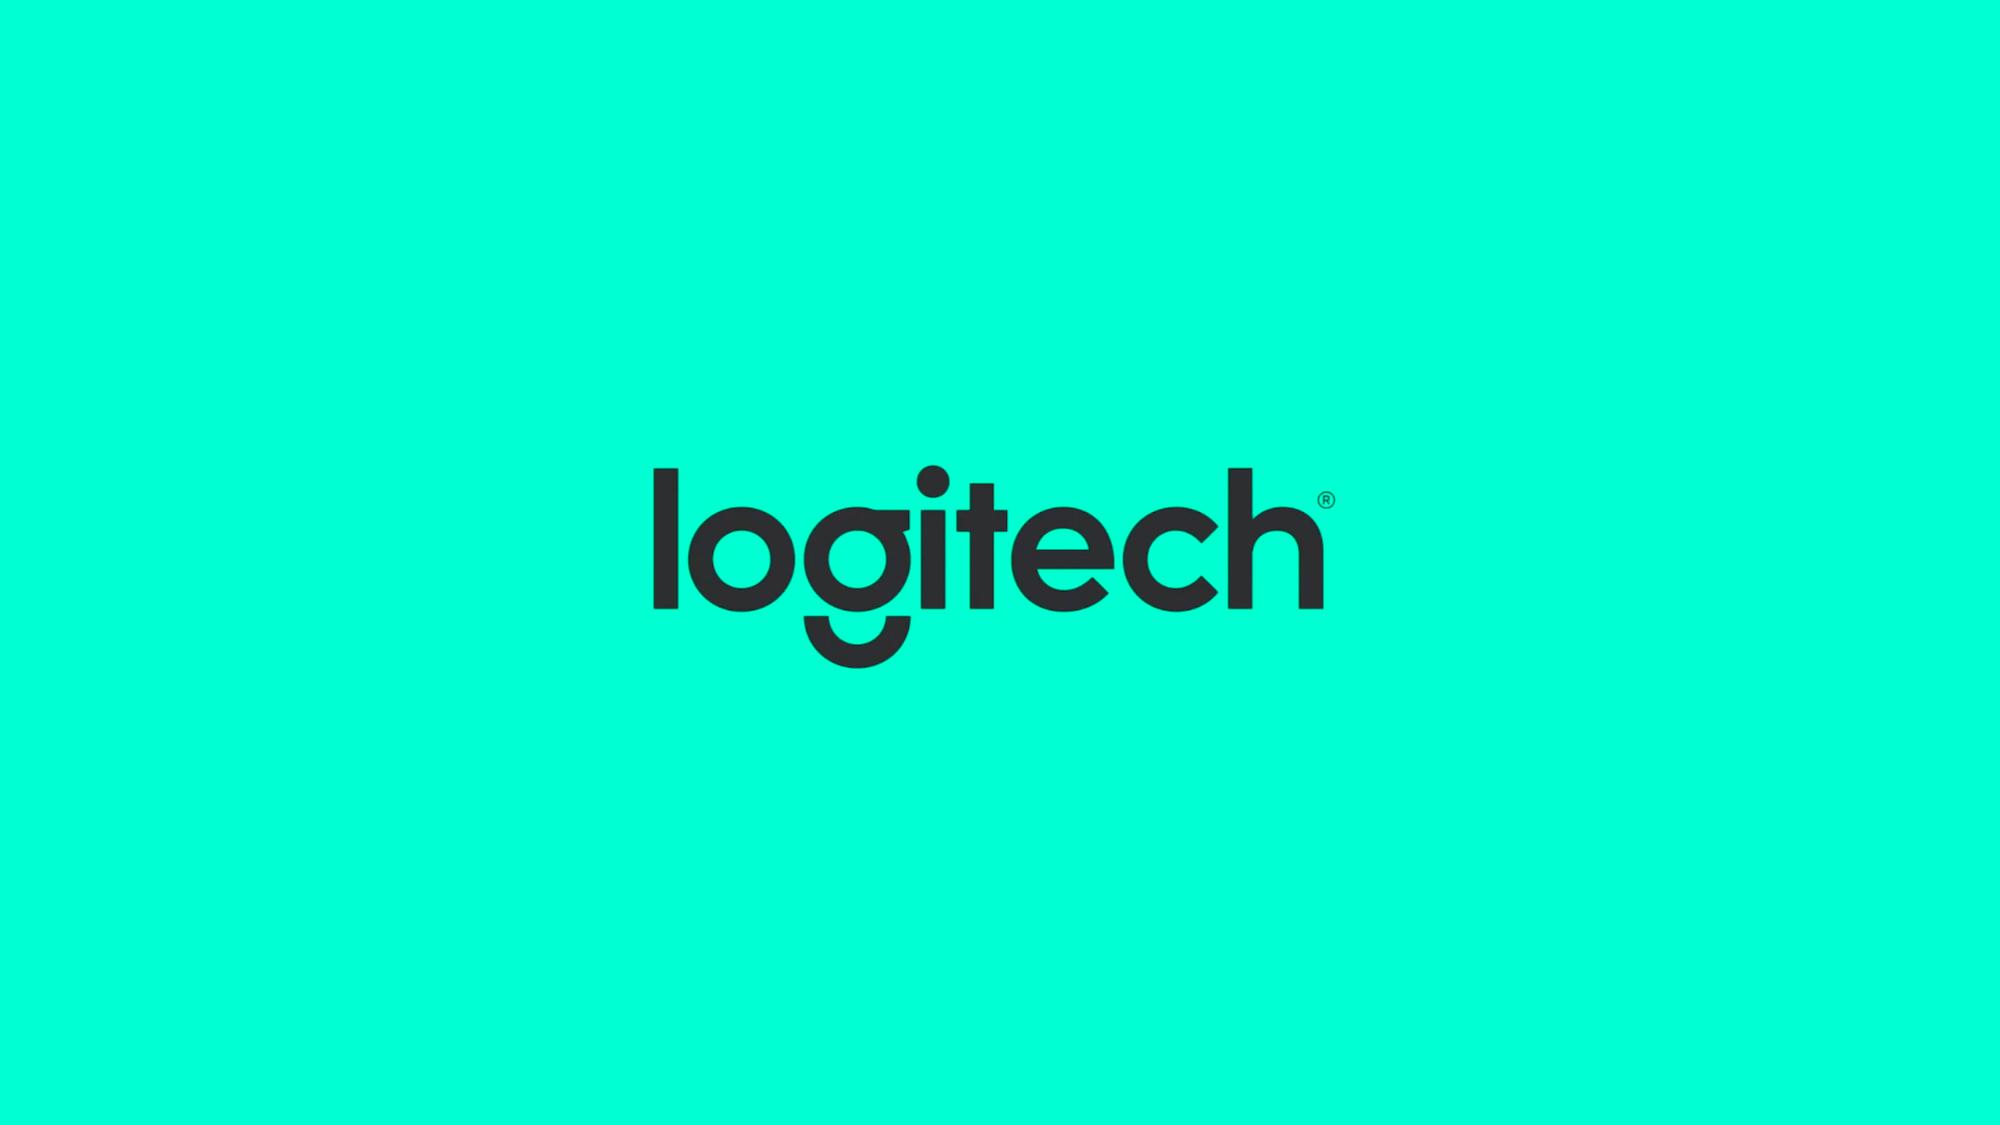 Logitech_DesignStudio_Goodfromyou-1.jpg